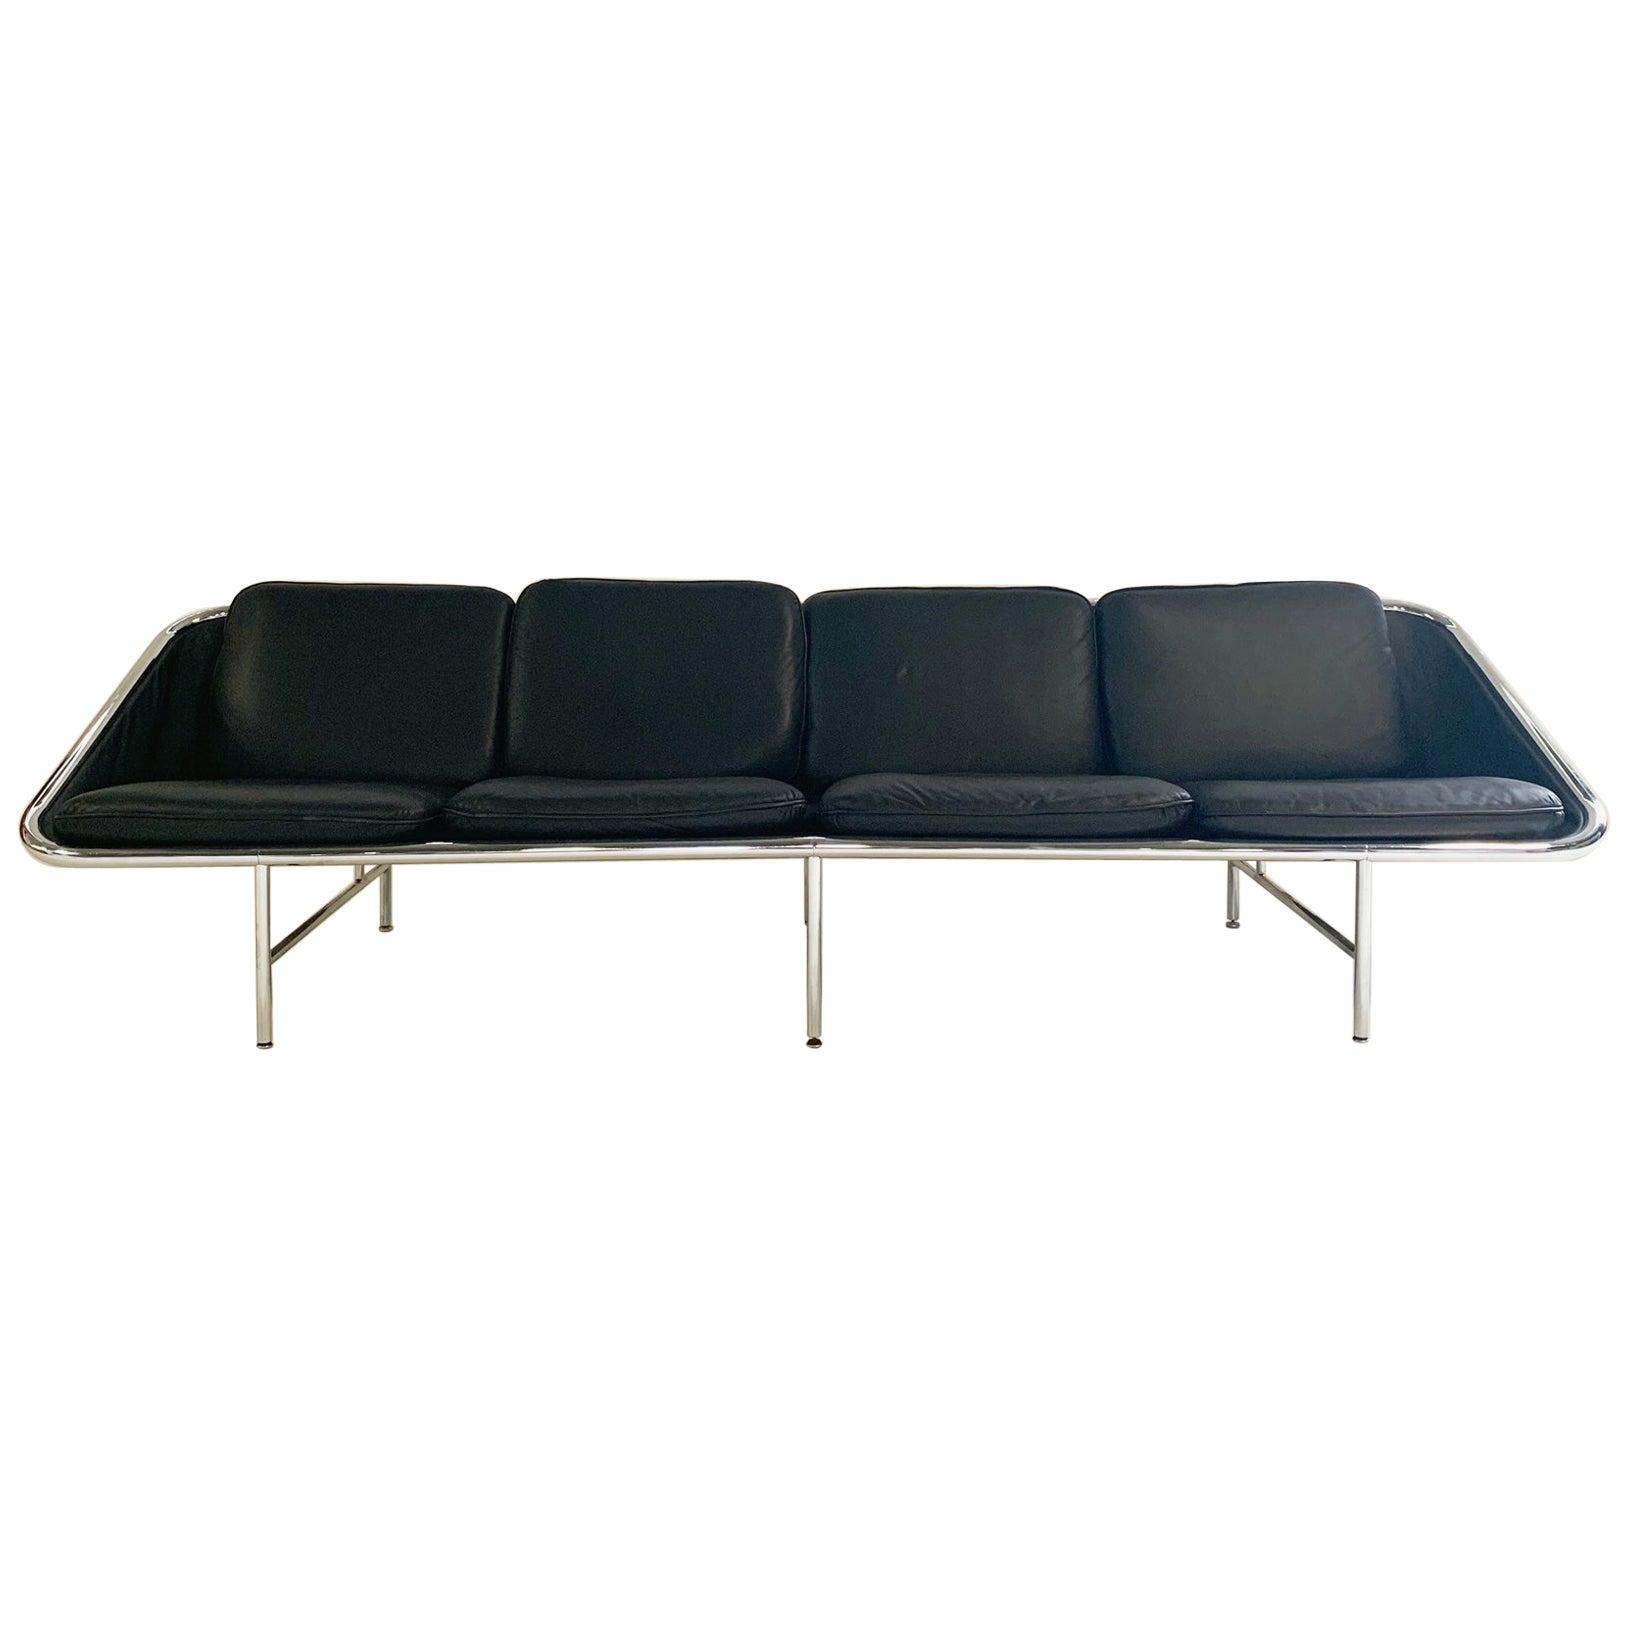 Model 6833 Leather Sling Sofa, George Nelson for Herman Miller